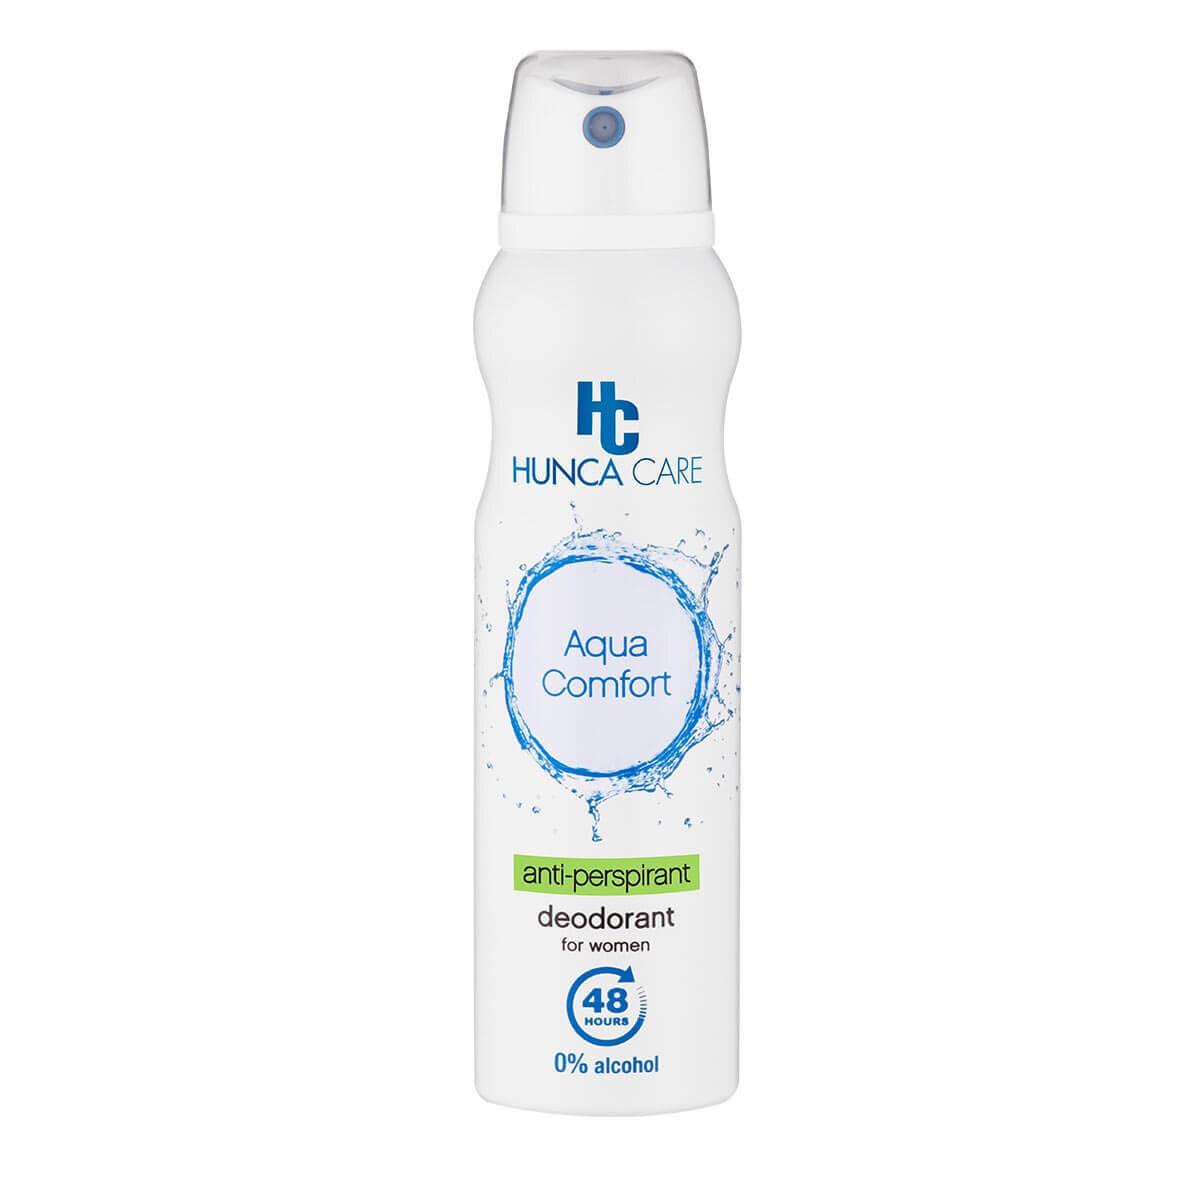 Aqua Comfort Kadın Deodorant 150ml